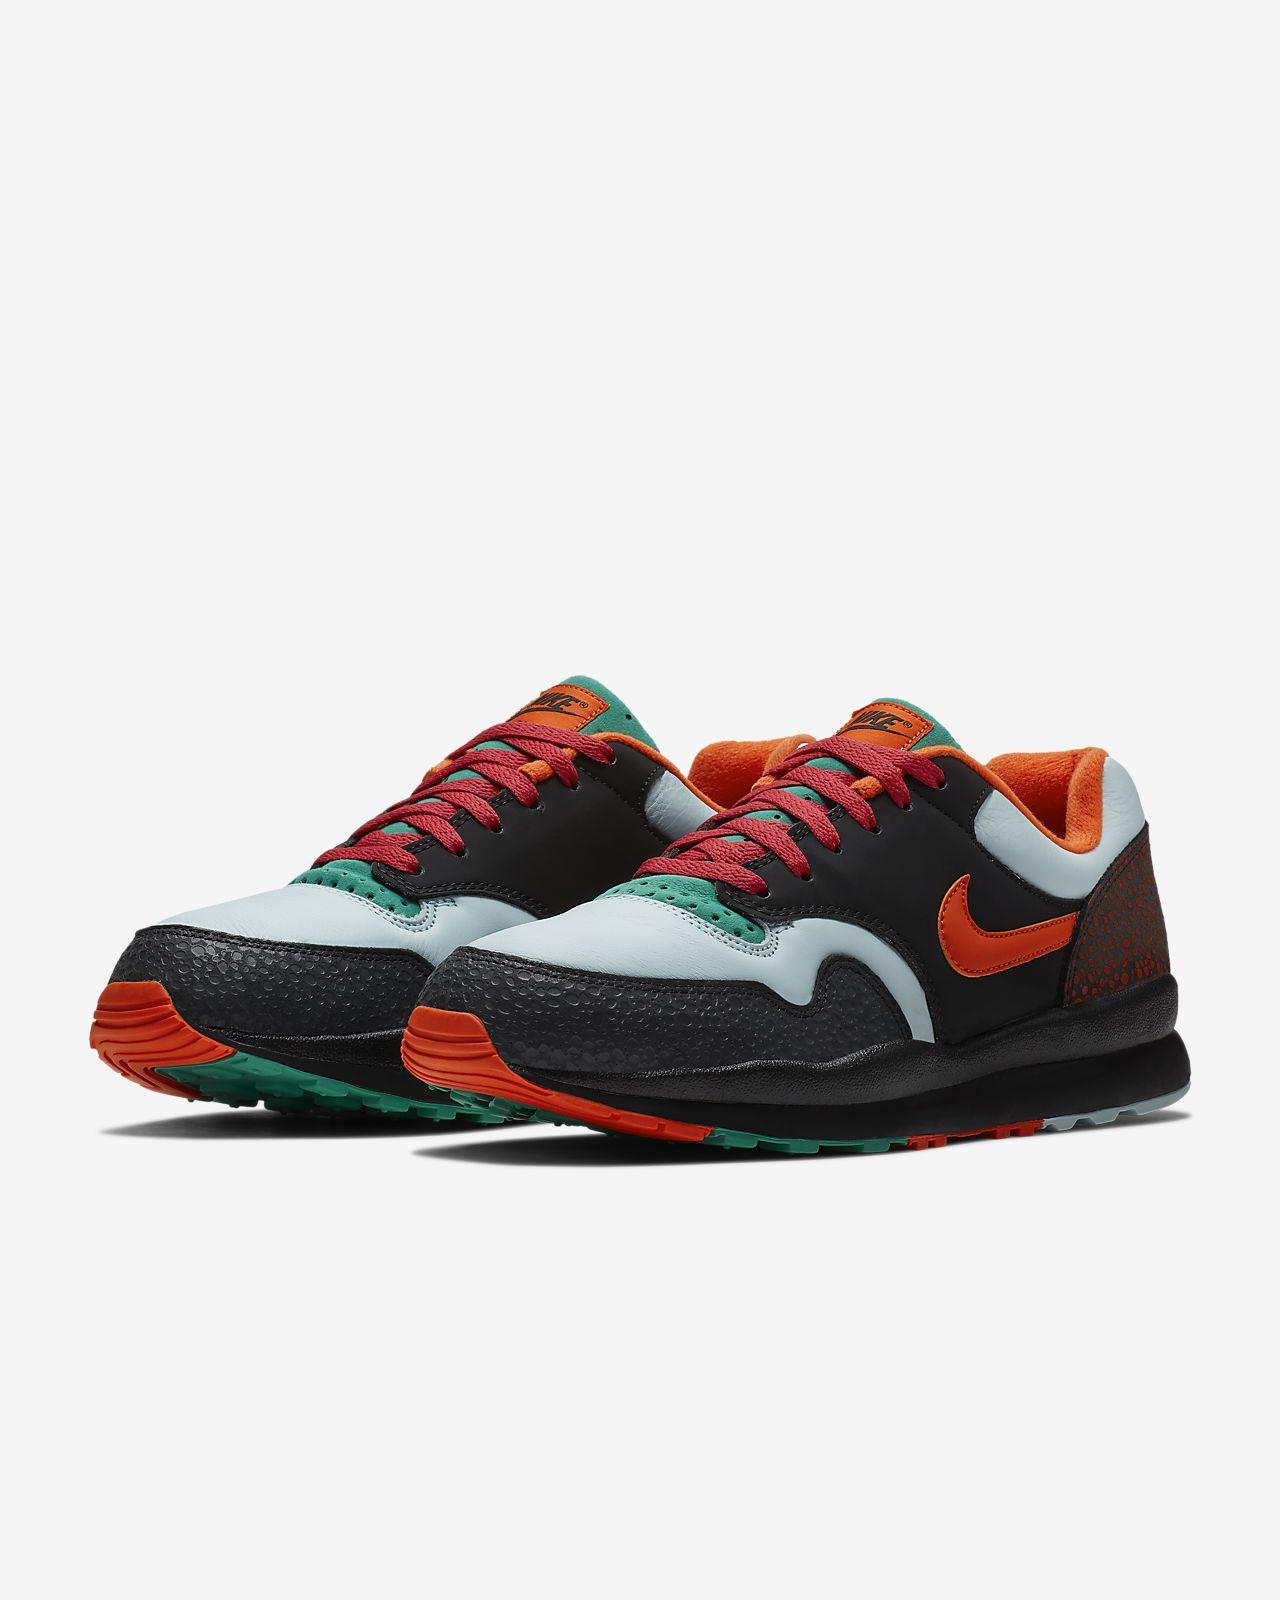 83a176fbff Nike Air Safari SE Men's Shoe. Nike.com AU